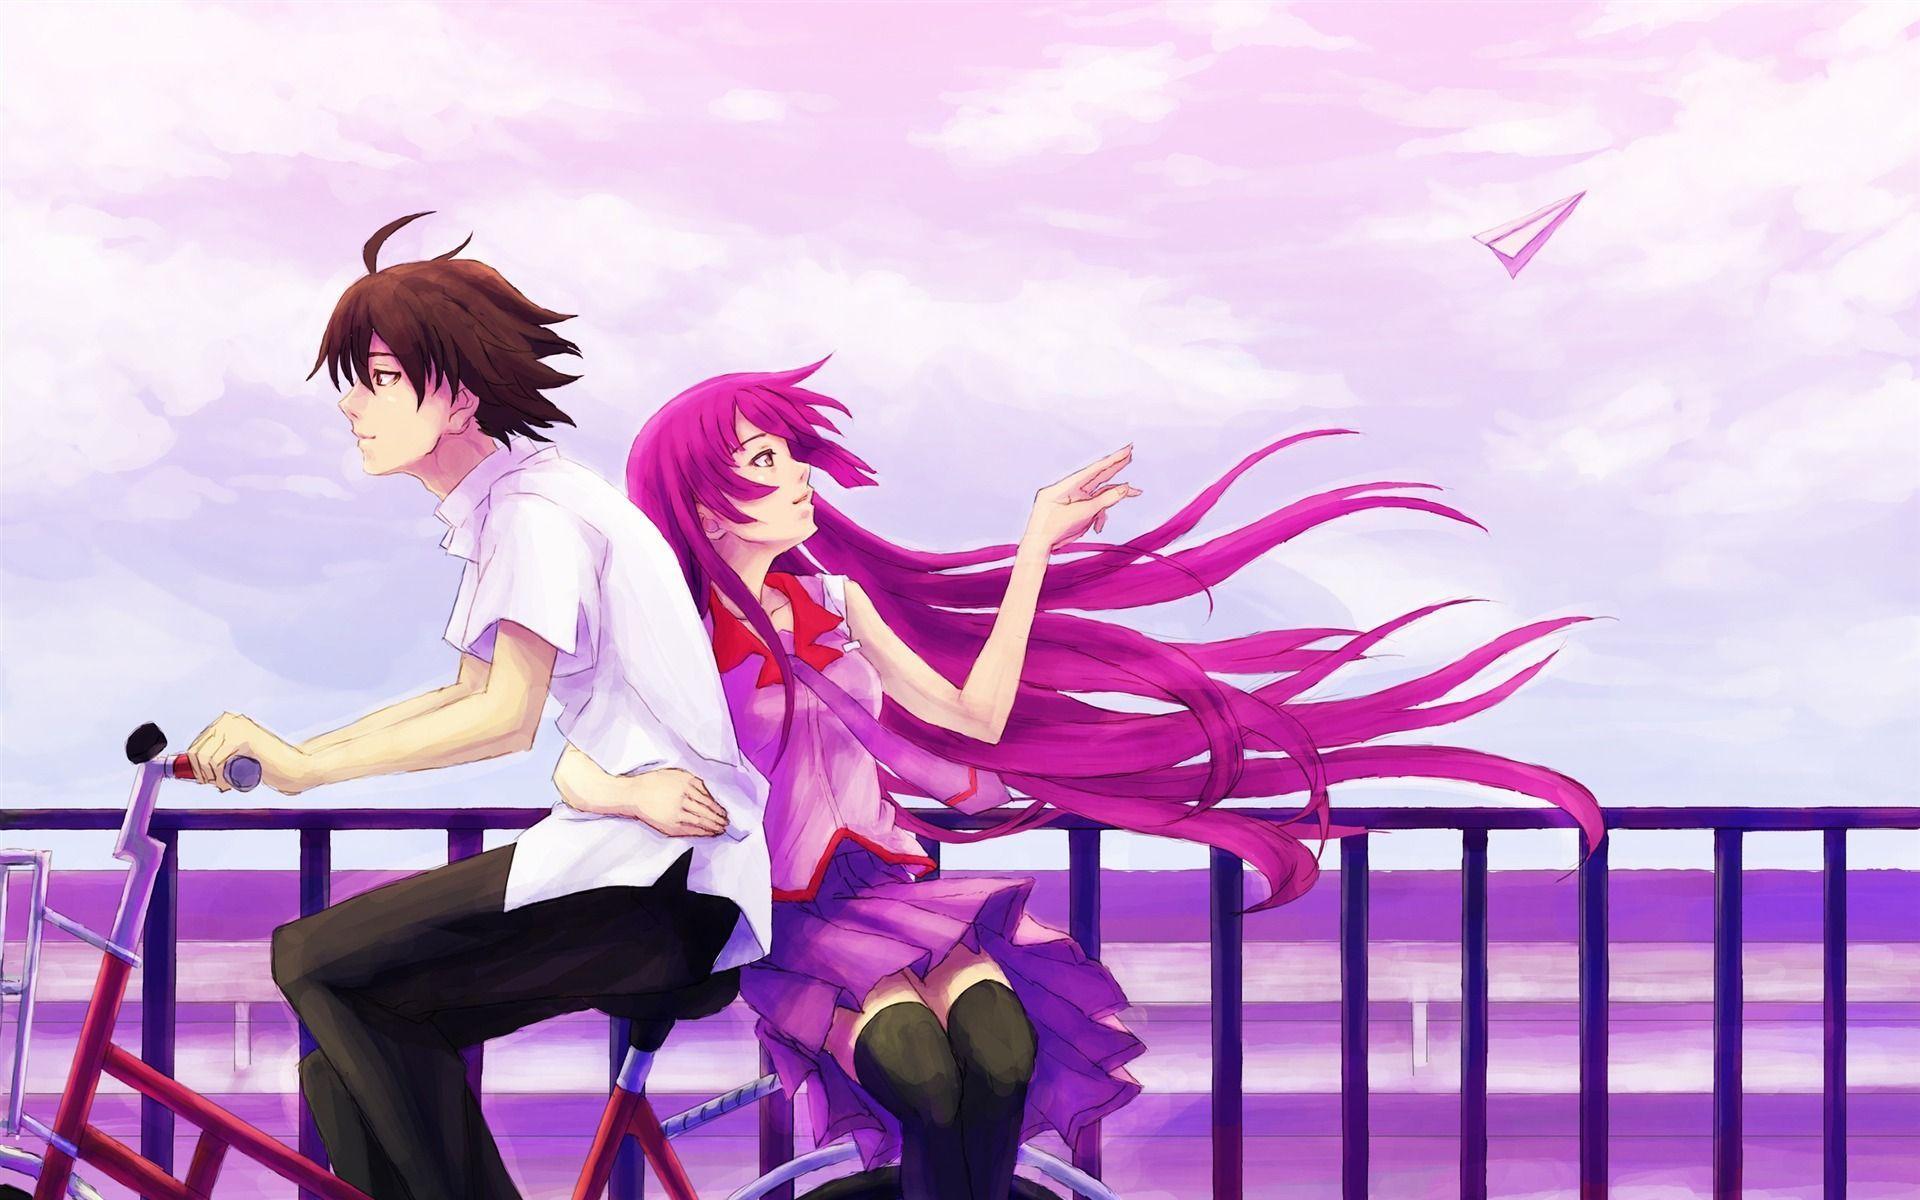 Sad Romantic Anime Wallpapers Top Free Sad Romantic Anime